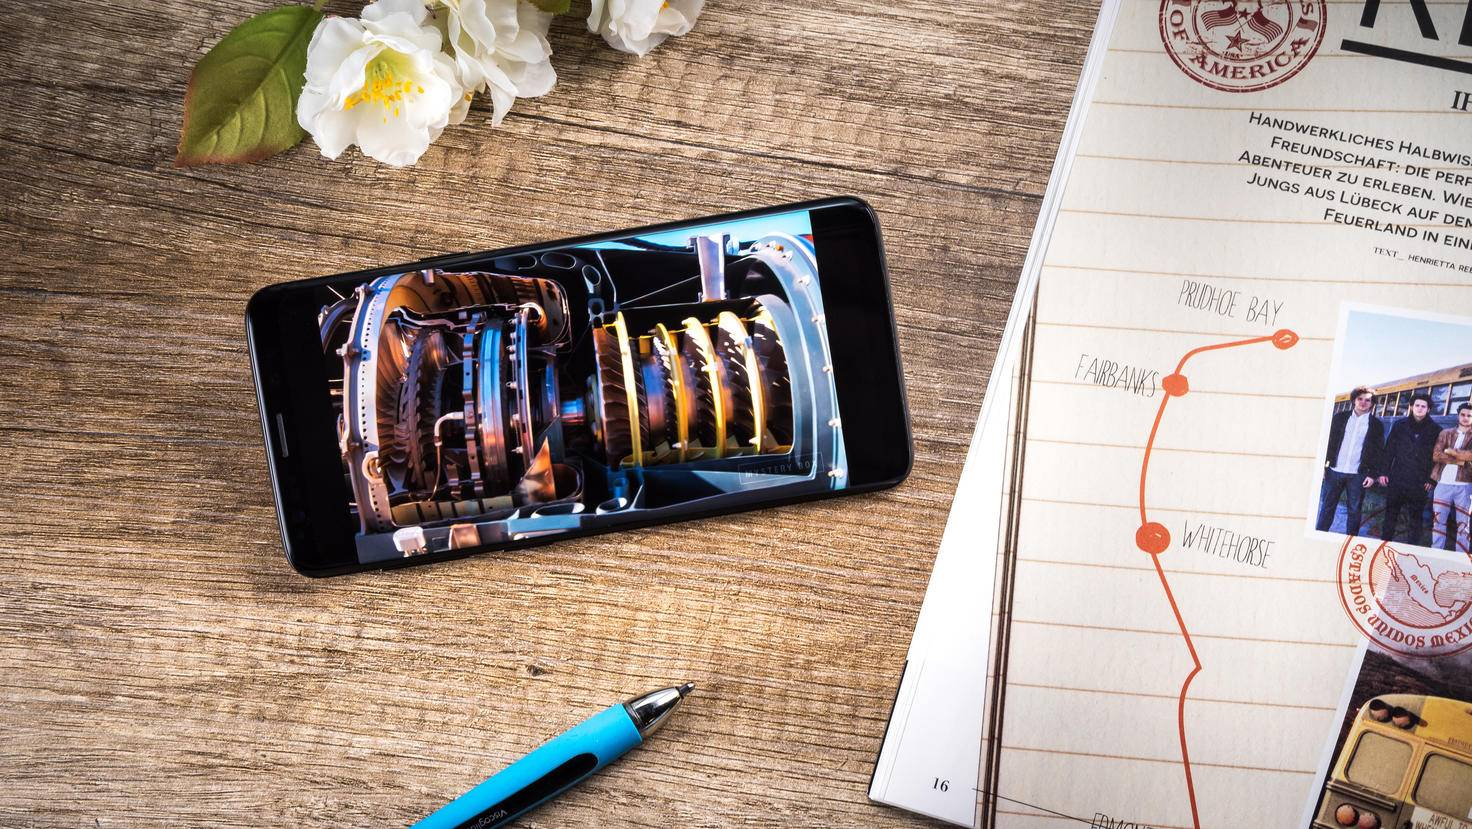 Samsung-Galaxy-S9-HDR-1